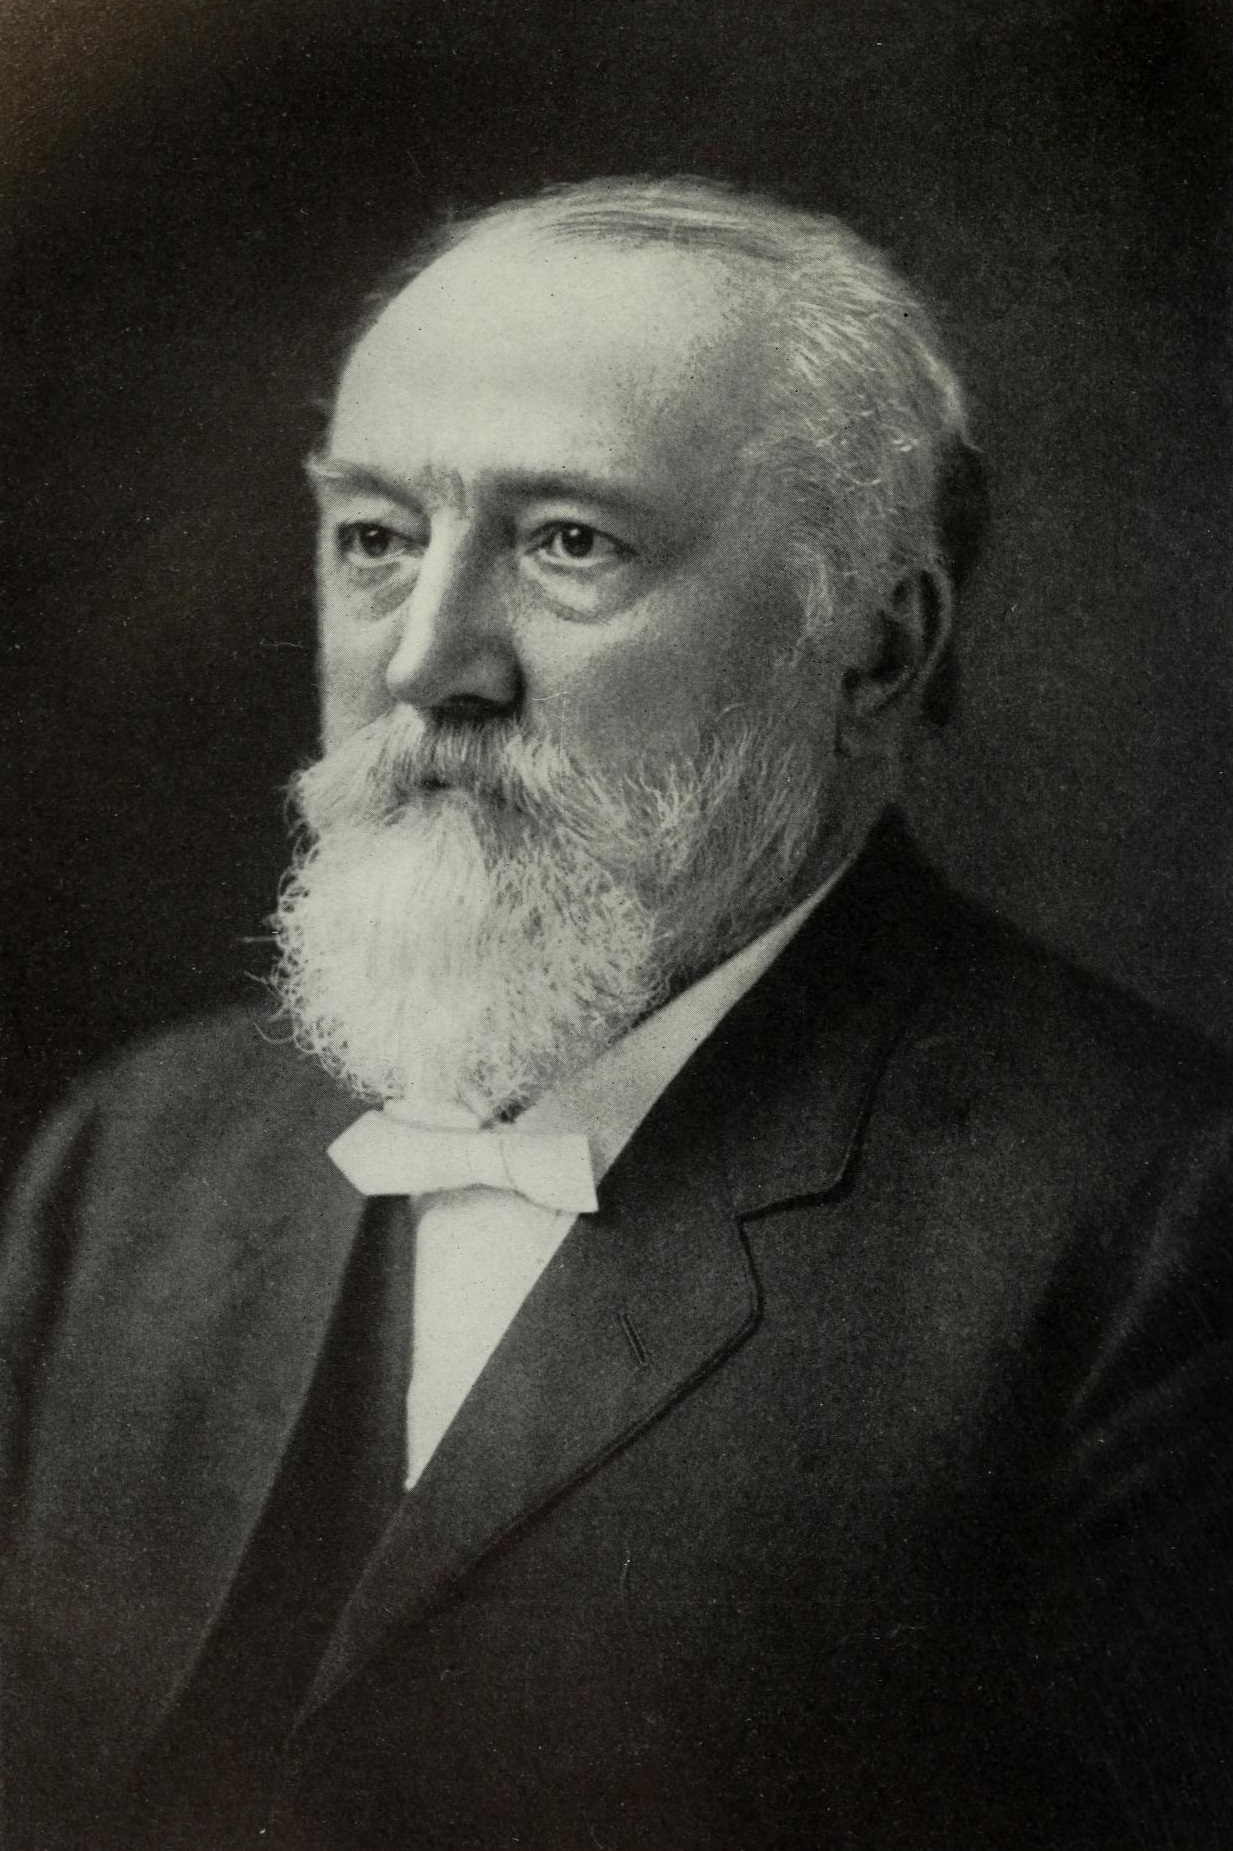 Rudolph Blankenburg